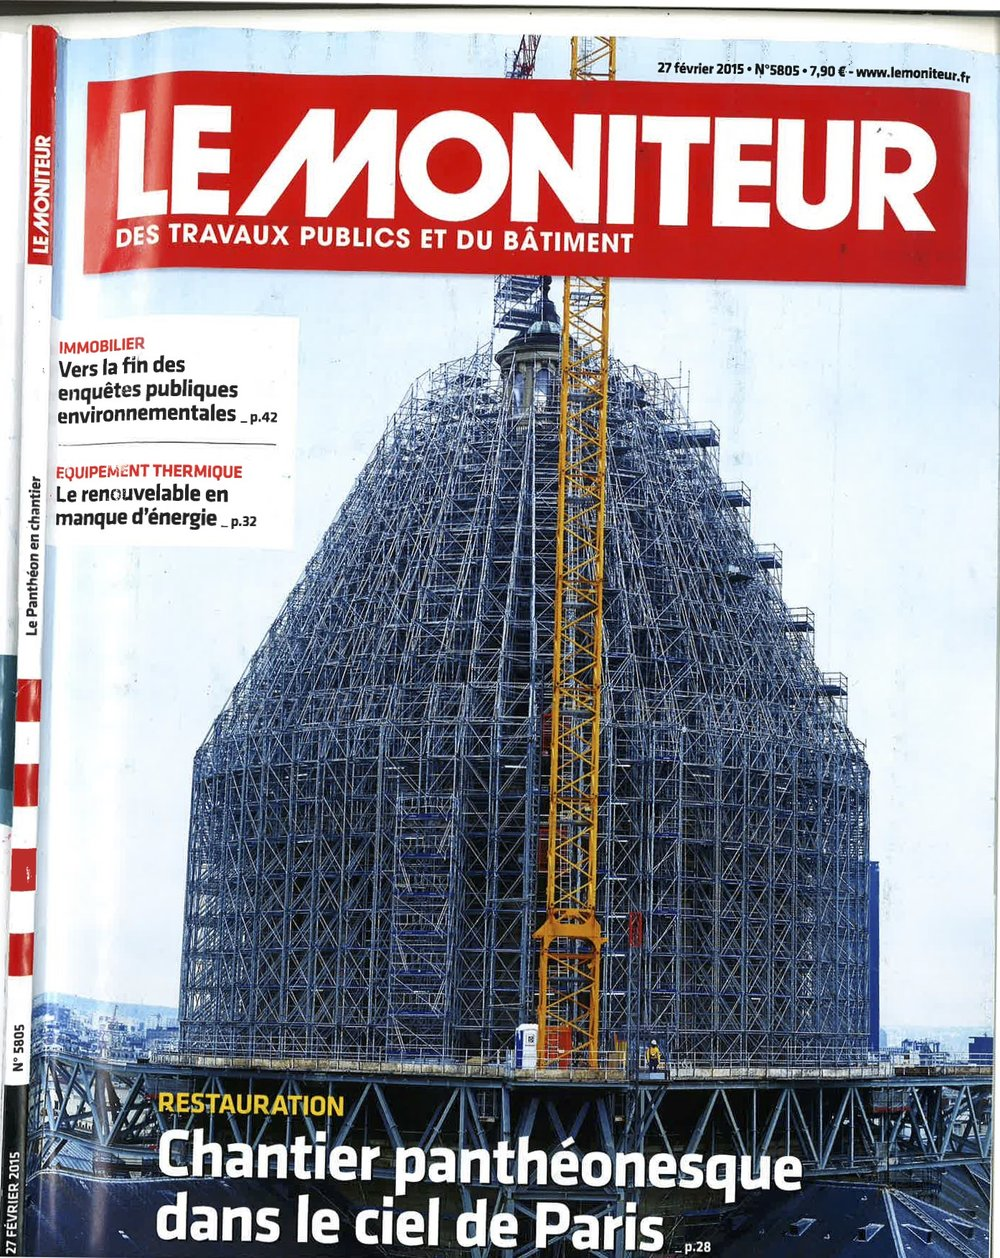 Eiffage Moniteur n¯5805.jpg